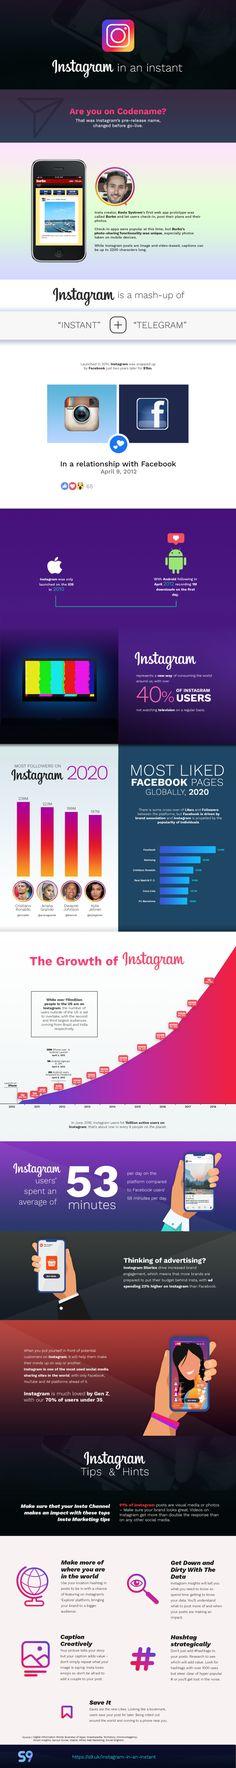 Instagram 2020: Alles, was du über die Social-Plattform wissen musst   OnlineMarketing.de Social Media Services, Social Media Content, Social Networks, Erp System, Instagram Facts, Instagram Marketing Tips, Social Marketing, Affiliate Marketing, Media Marketing